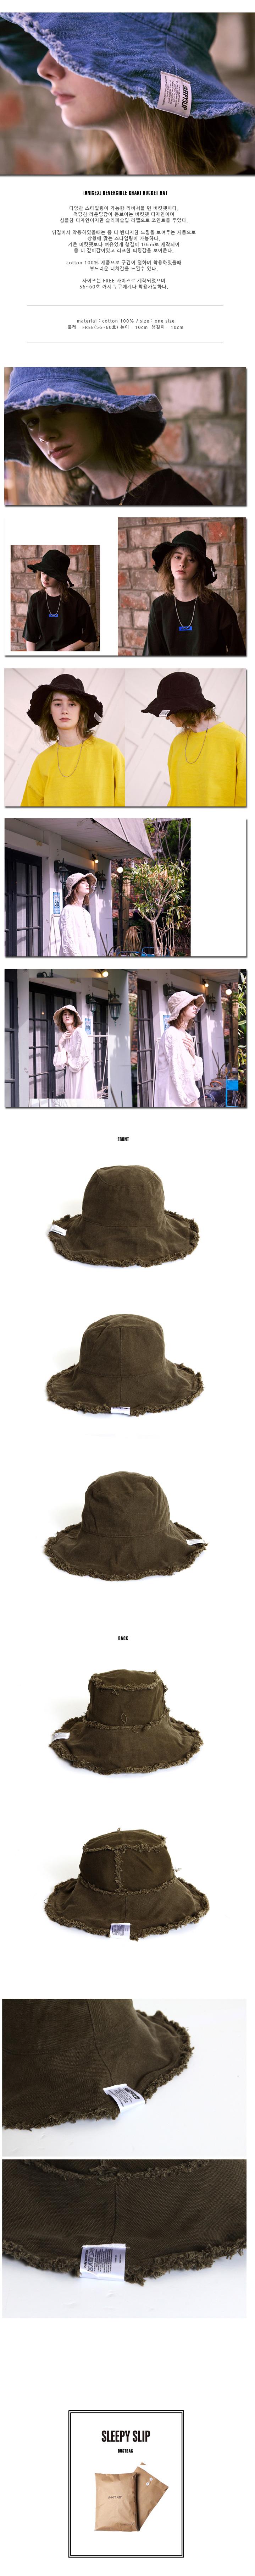 reversible-khaki-bucket-hat.jpg